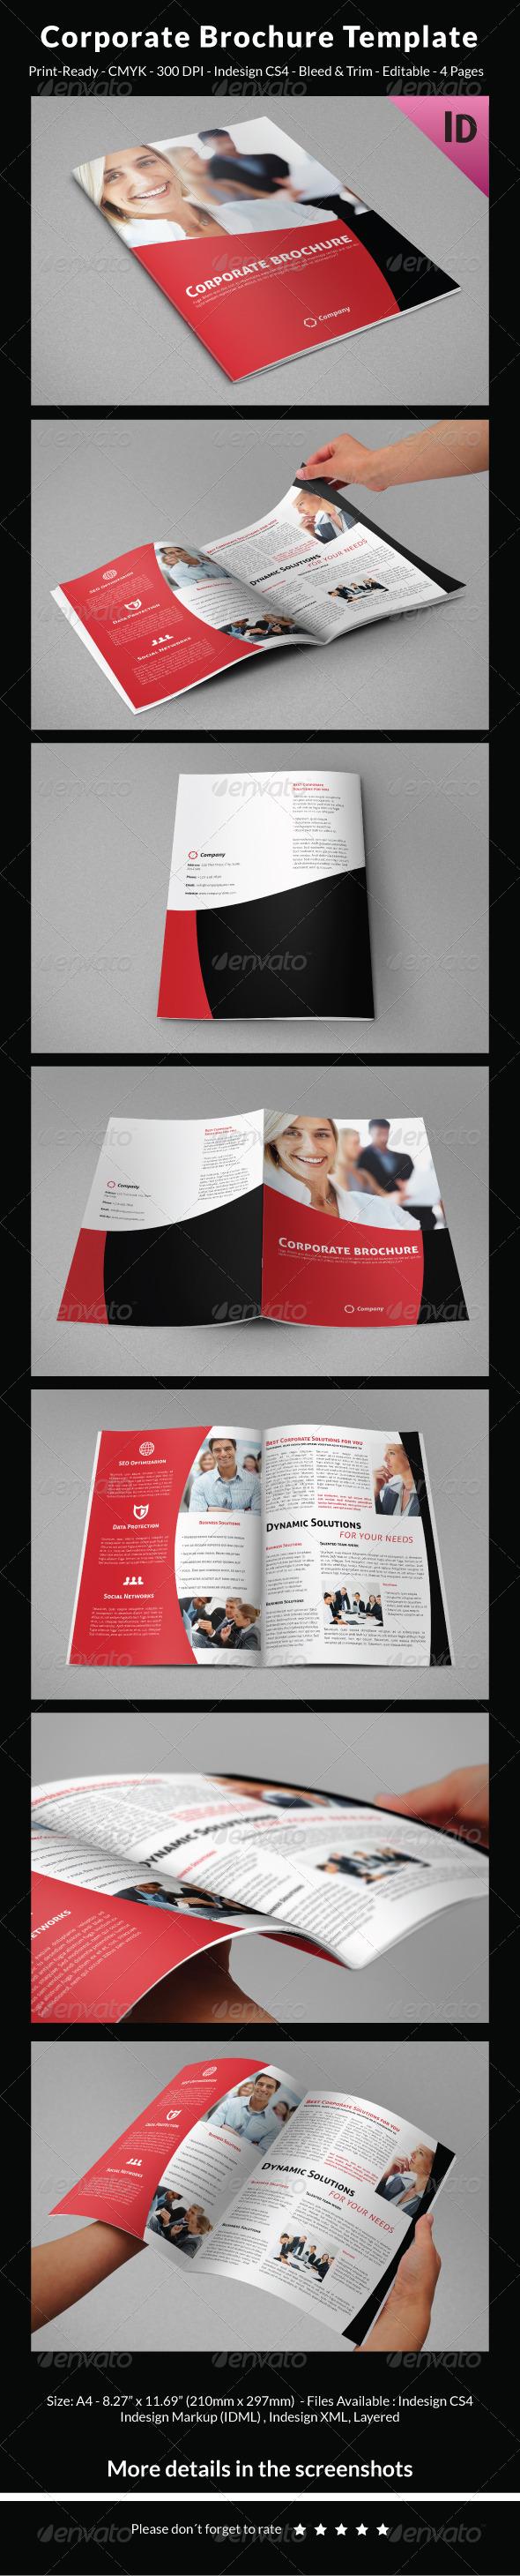 GraphicRiver Corporate Brochure Template 6501546